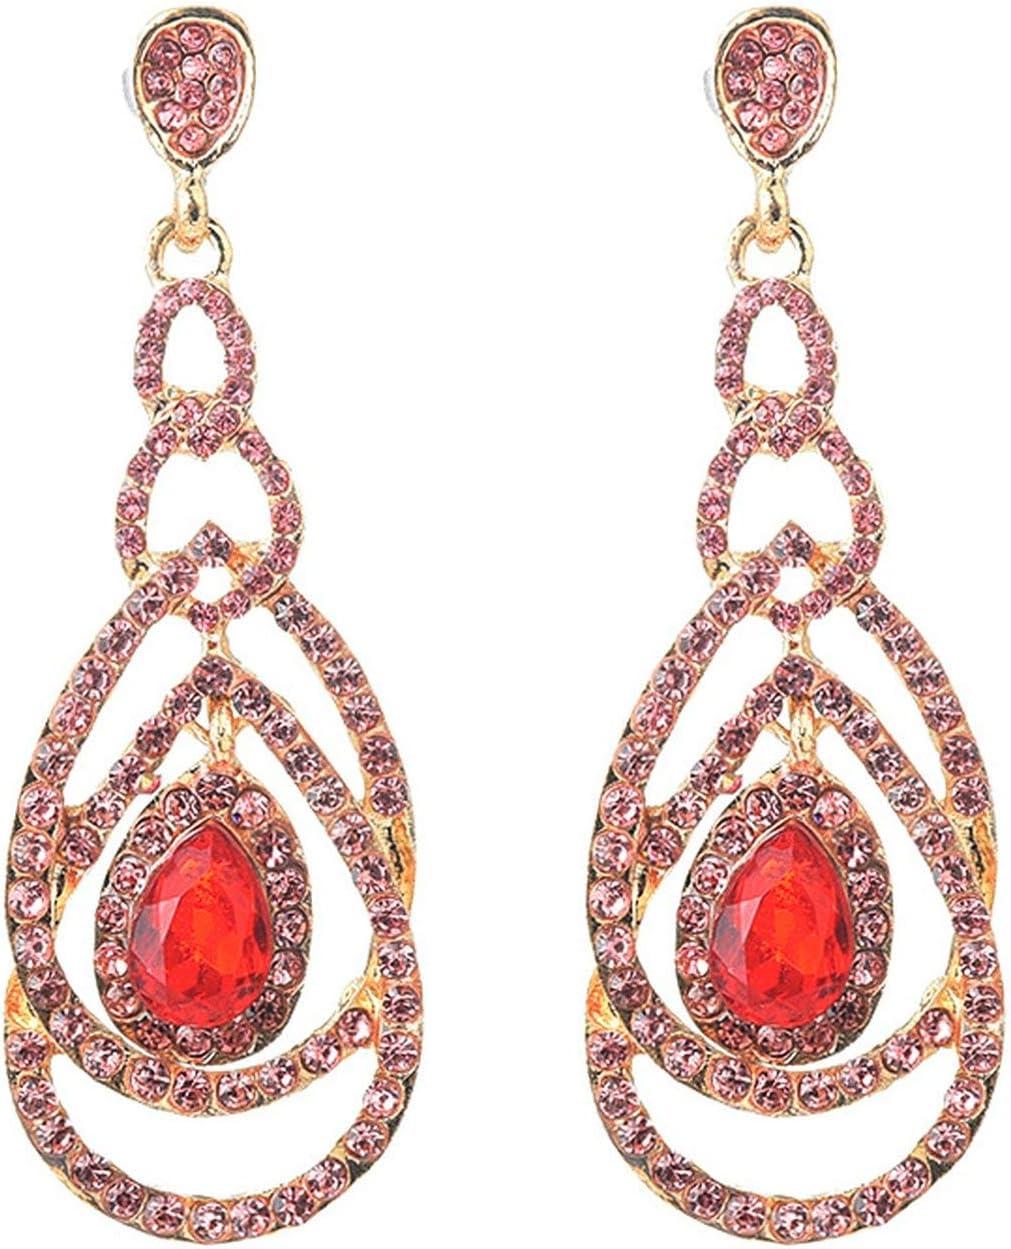 Cool House Uk Jewelry Exaggerated Long Geometric Circle Diamond Earrings Daily Wild Trend Full Diamond Earrings Amazon Co Uk Kitchen Home